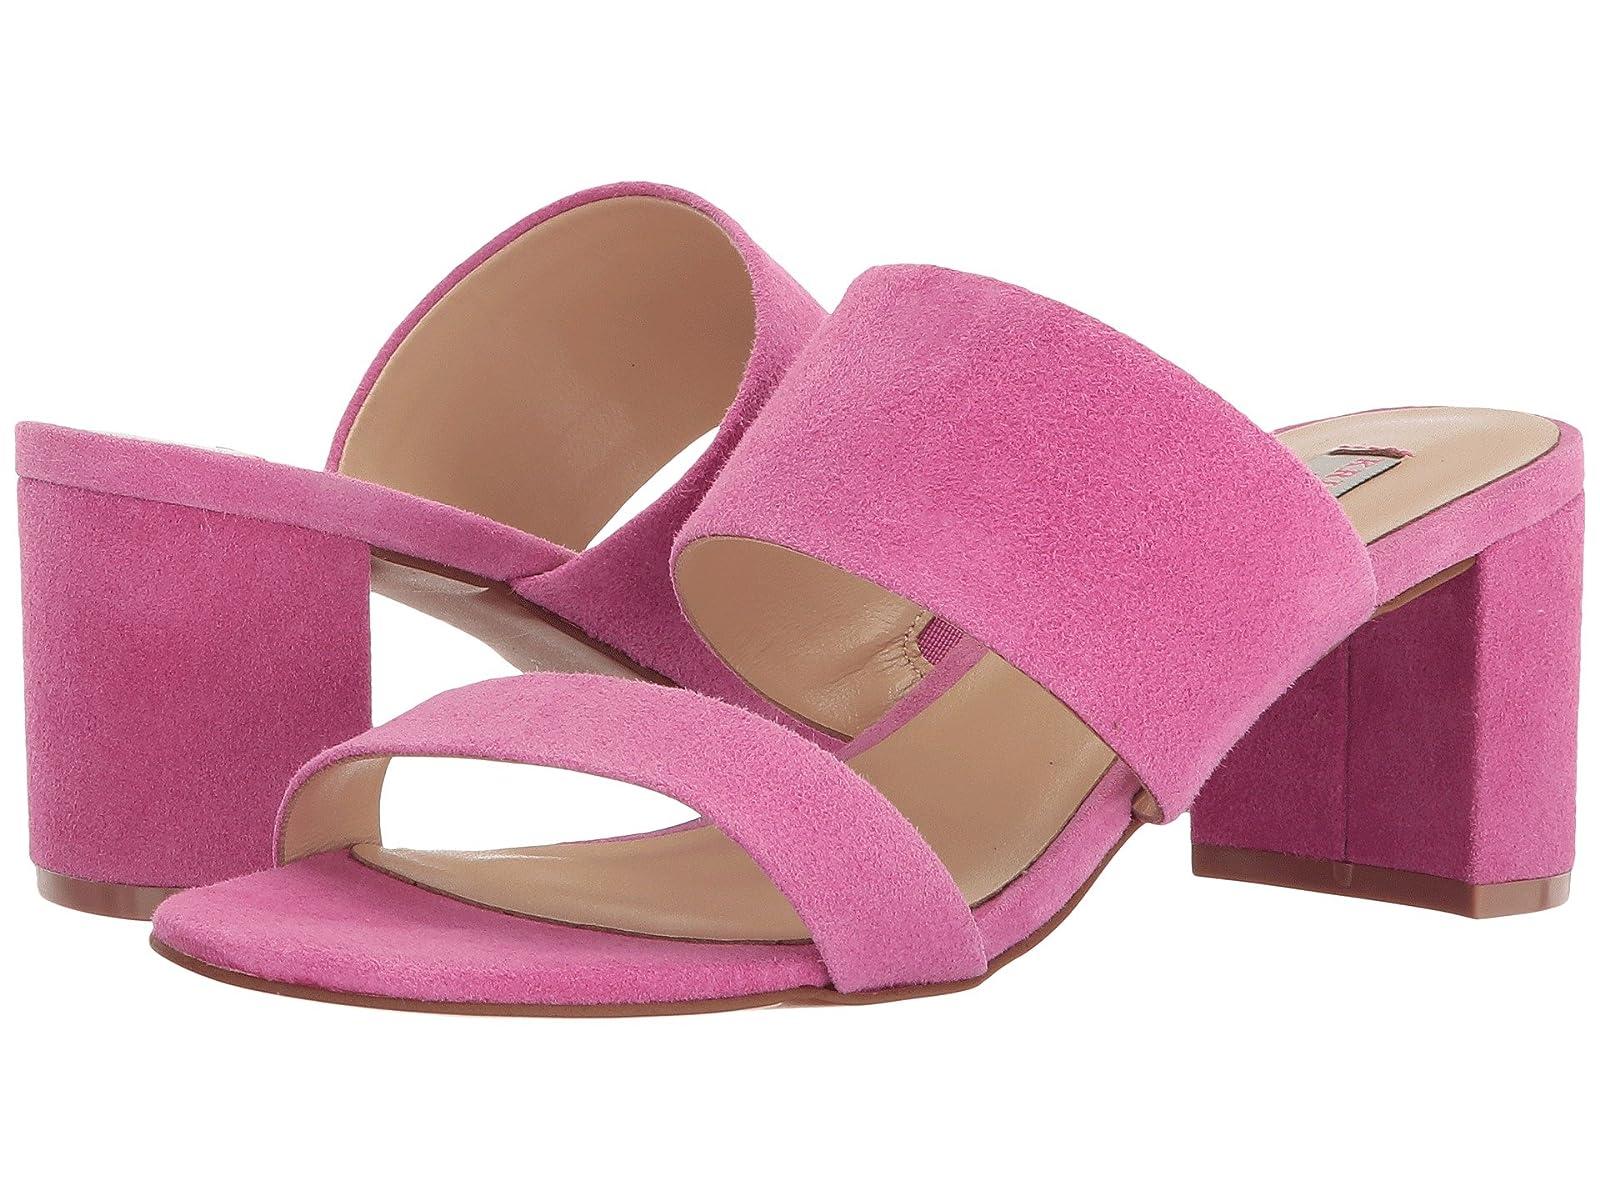 Kristin Cavallari Lakeview Slide SandalAtmospheric grades have affordable shoes